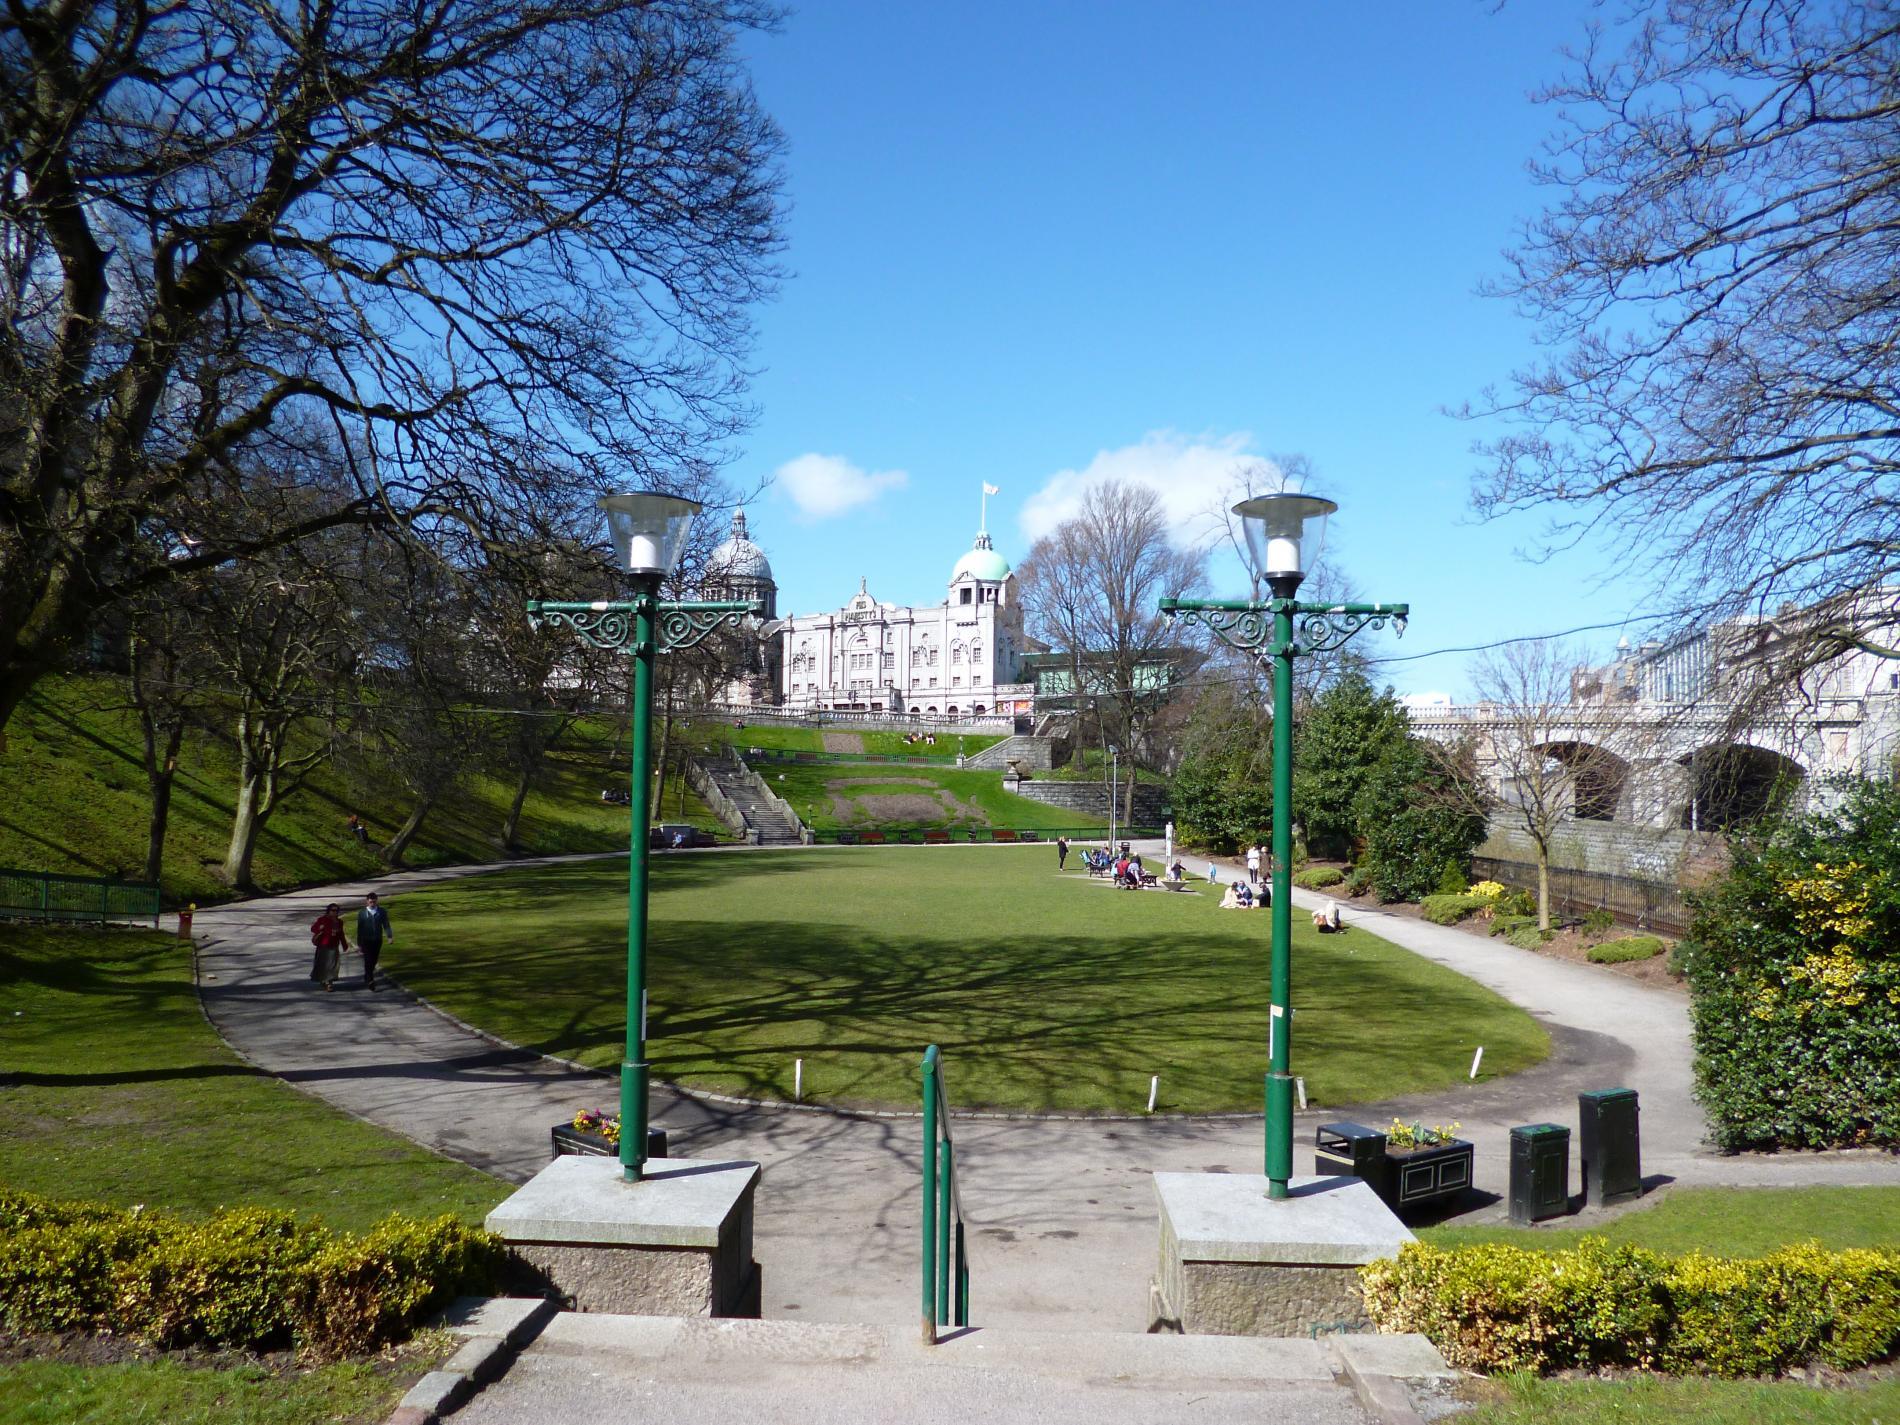 Union terrace gardens in aberdeen city centre for Terrace 33 city garden